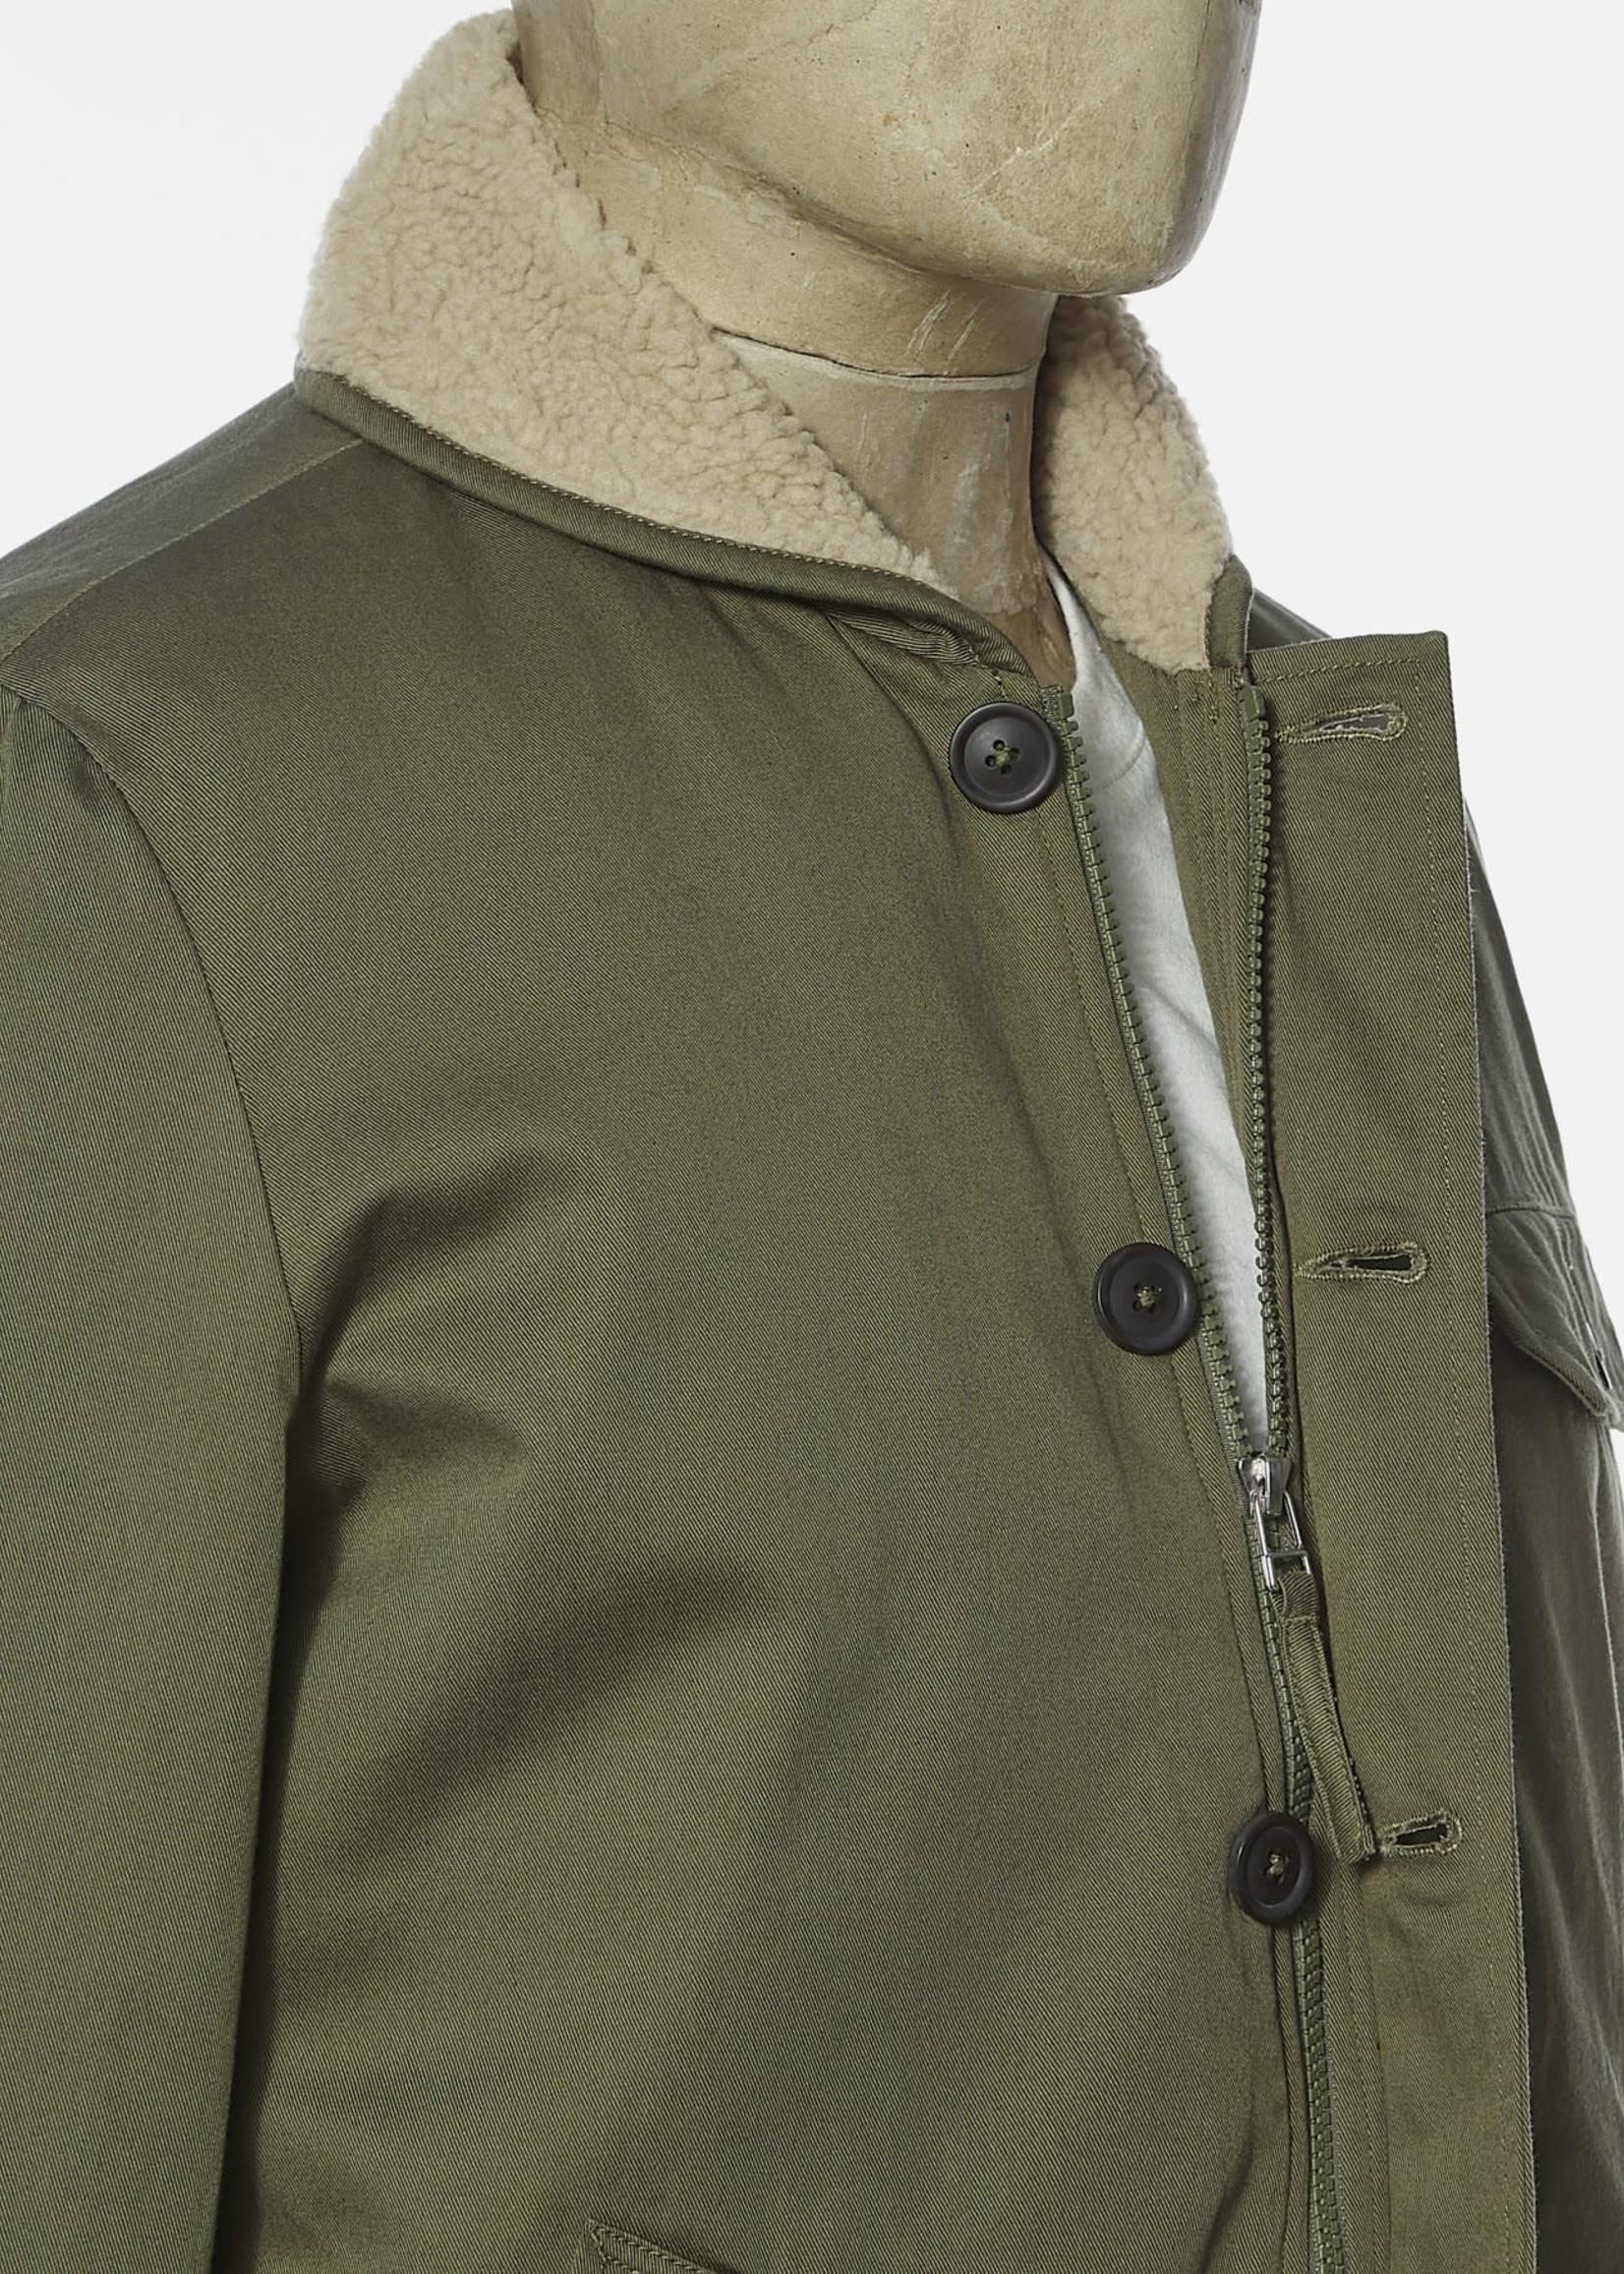 Universal Works Universal Works N1 Jacket Light Olive Twill